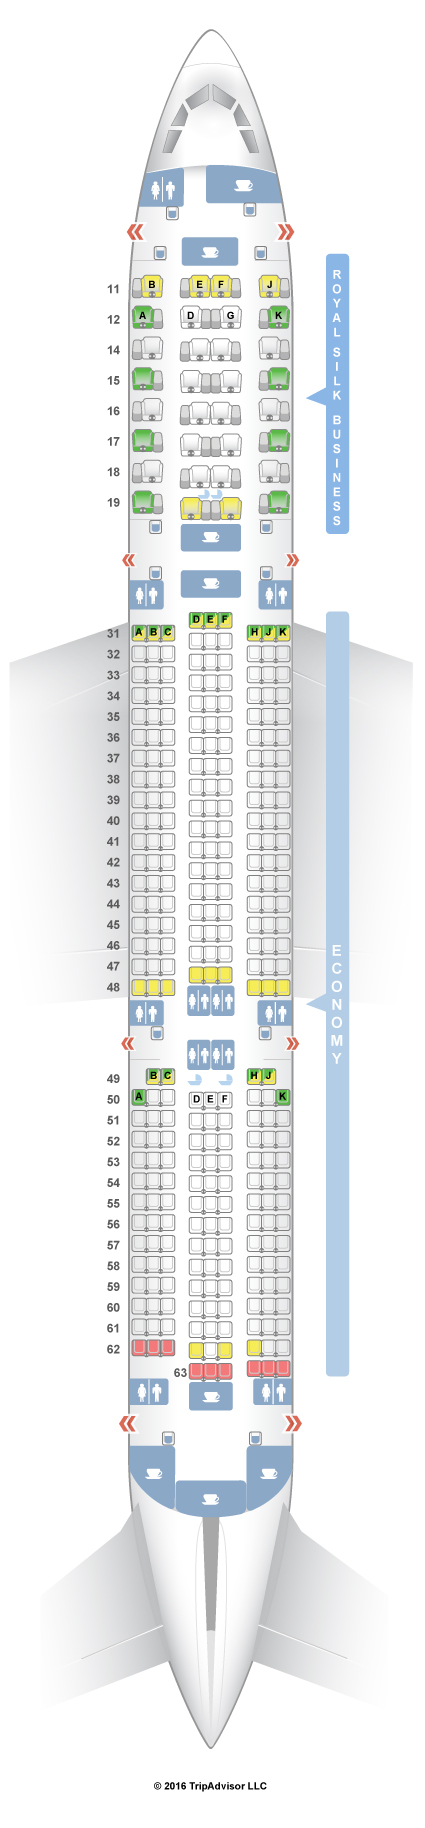 SeatGuru Seat Map THAI Airbus A350-900 (359) - SeatGuru   Reiseziele on